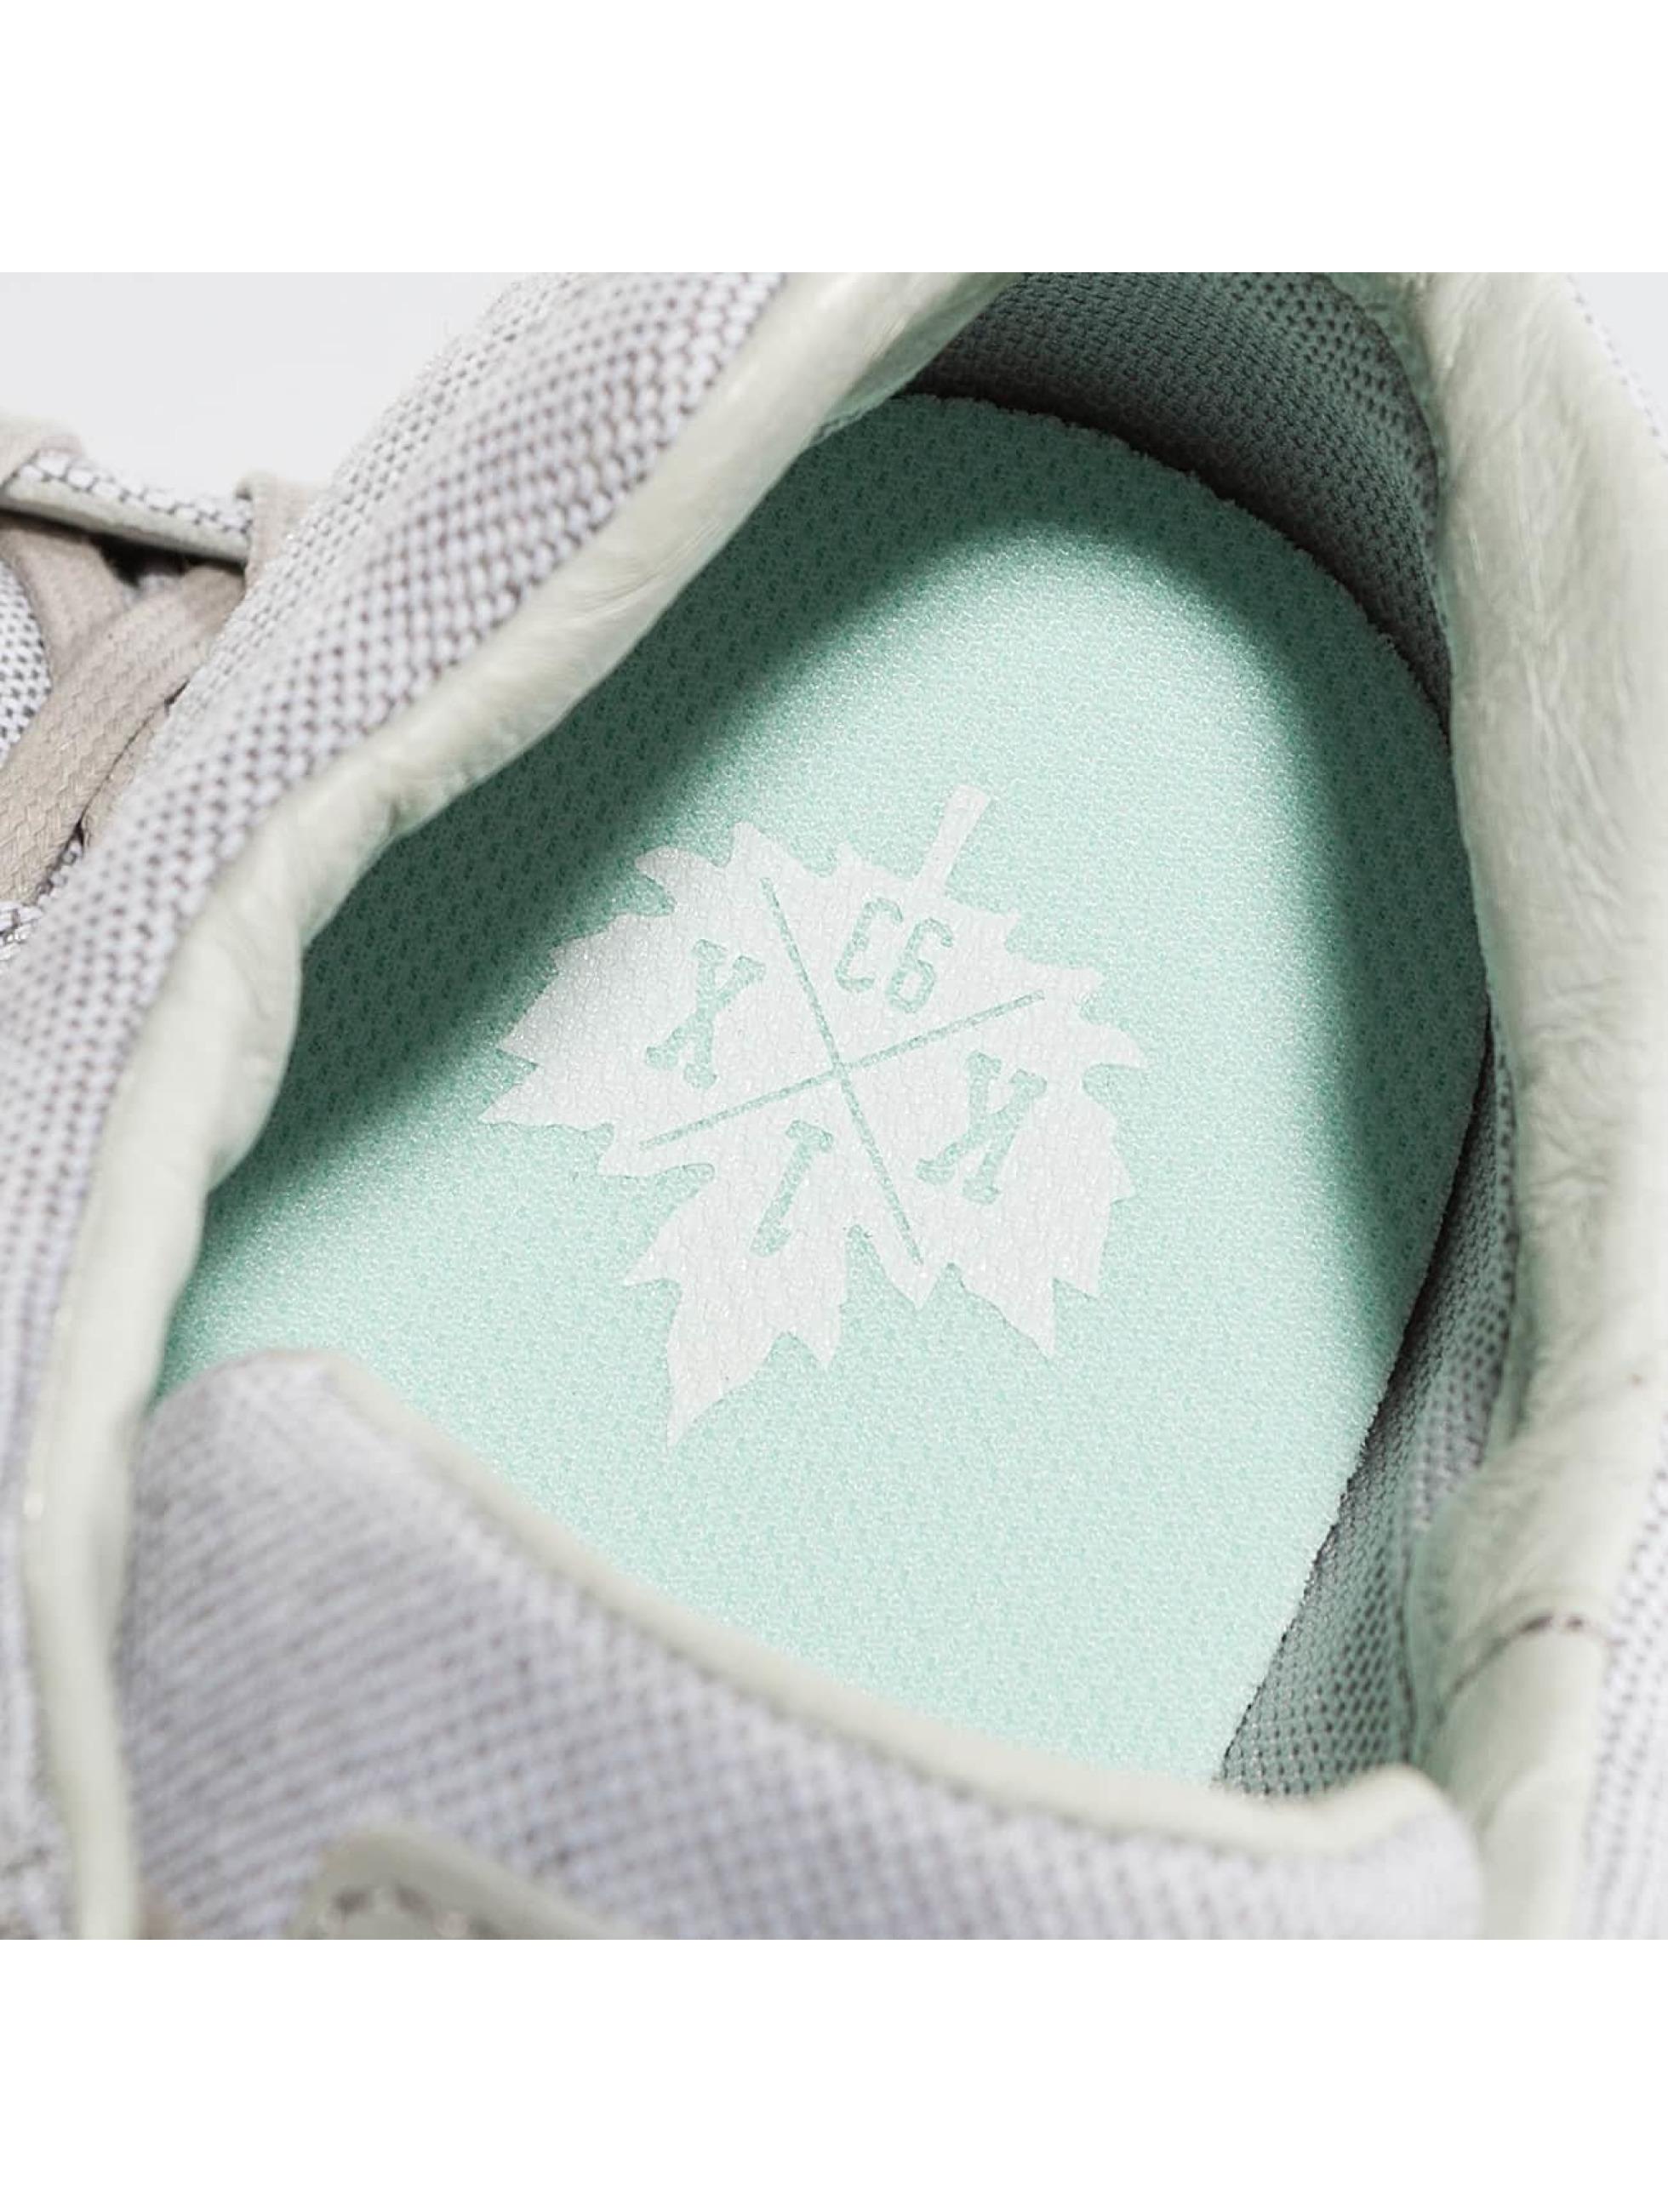 K1X Sneakers Dress Up Light Weight grey